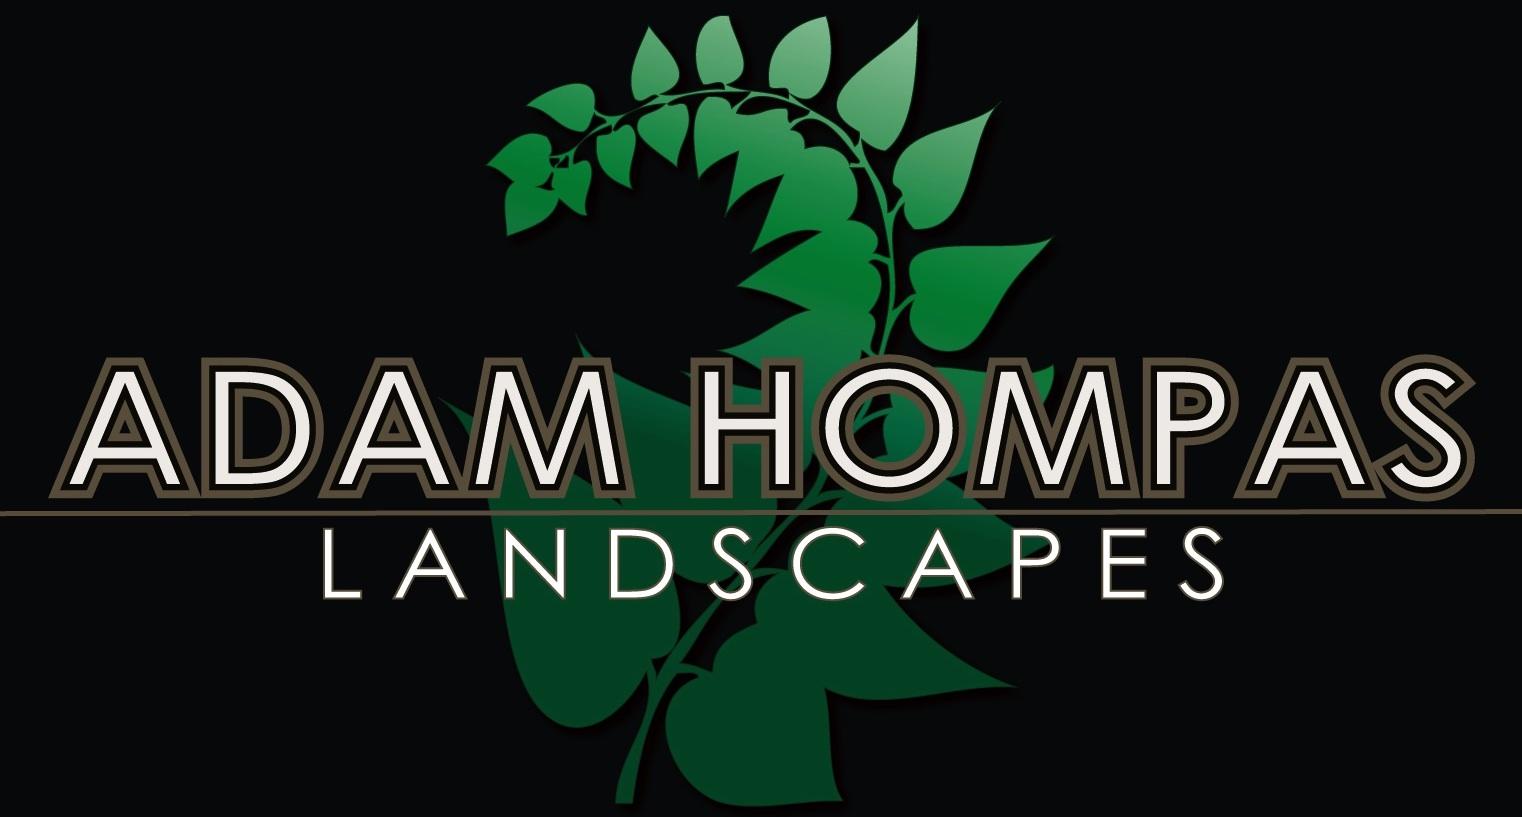 Adam Hompas Landscapes